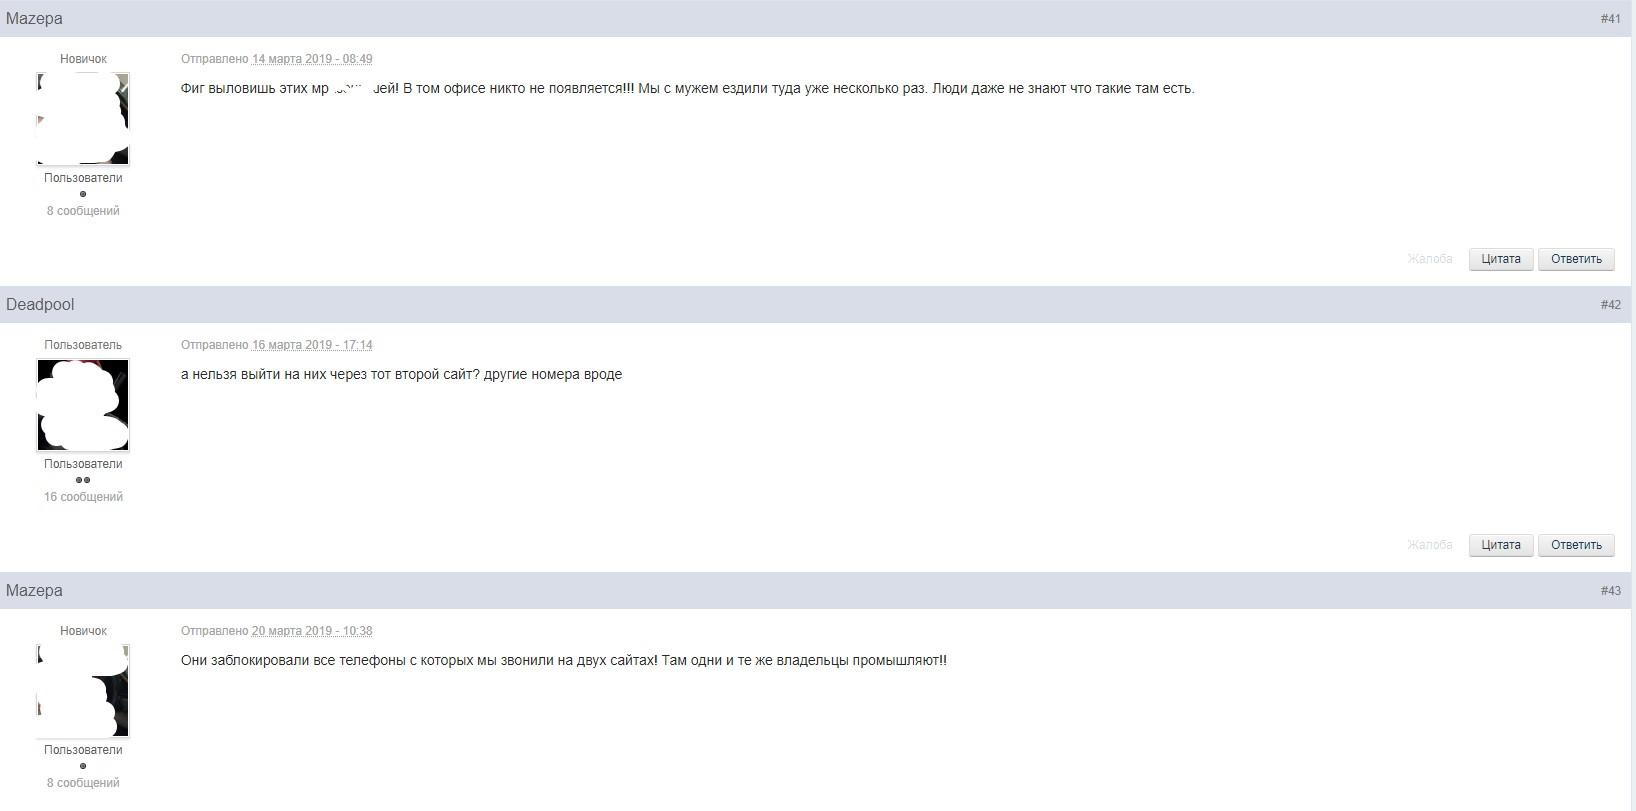 Euro Garant отзывы на сайте forum-eu.com